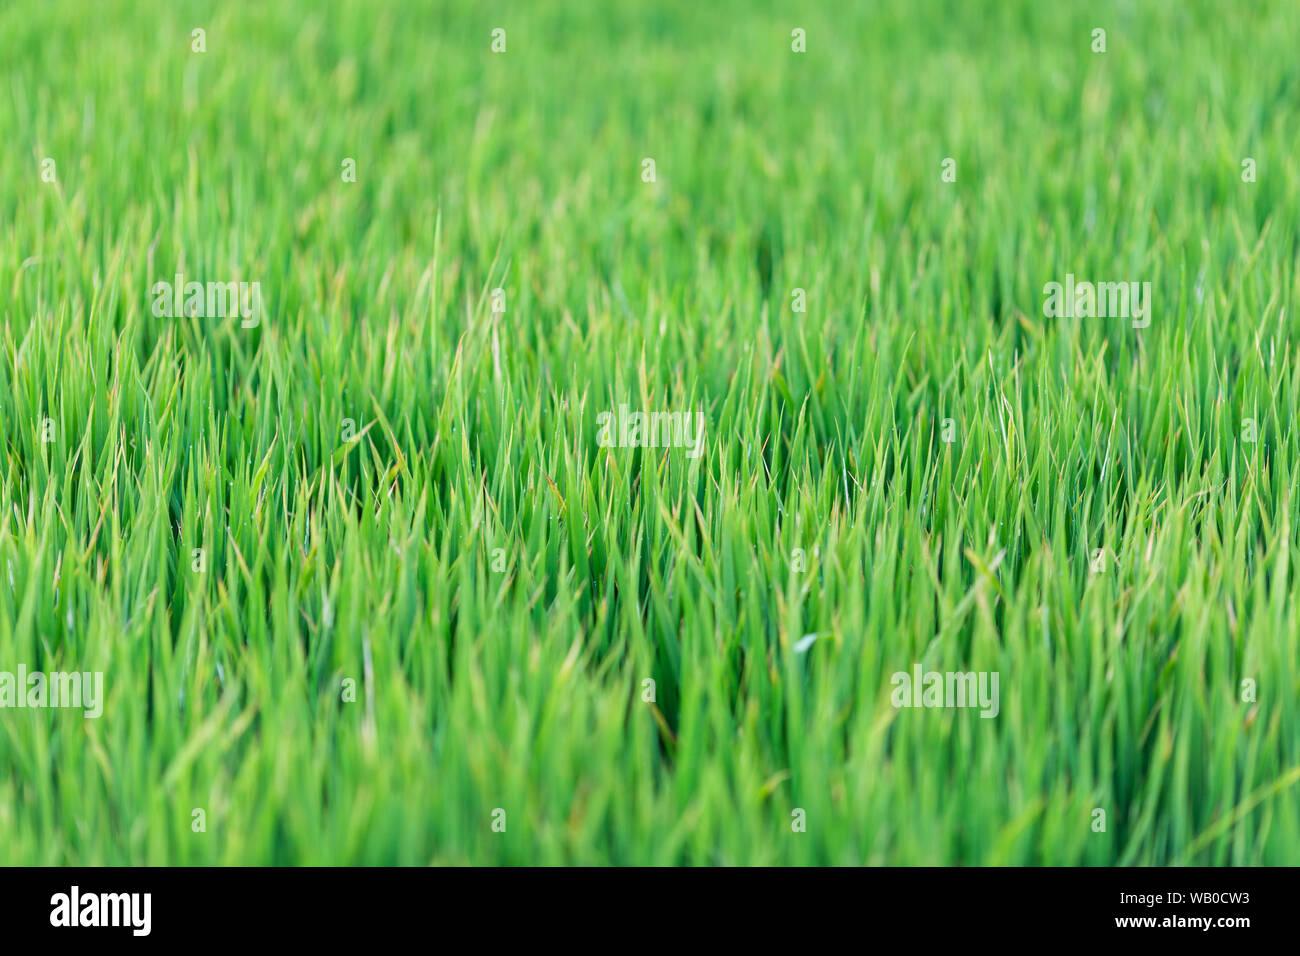 Green Grass Texture Background Green Lawn Backyard For Background Wallpaper Green Lawn Desktop Picture Park Lawn Texture Wet Grass Texture With Stock Photo Alamy